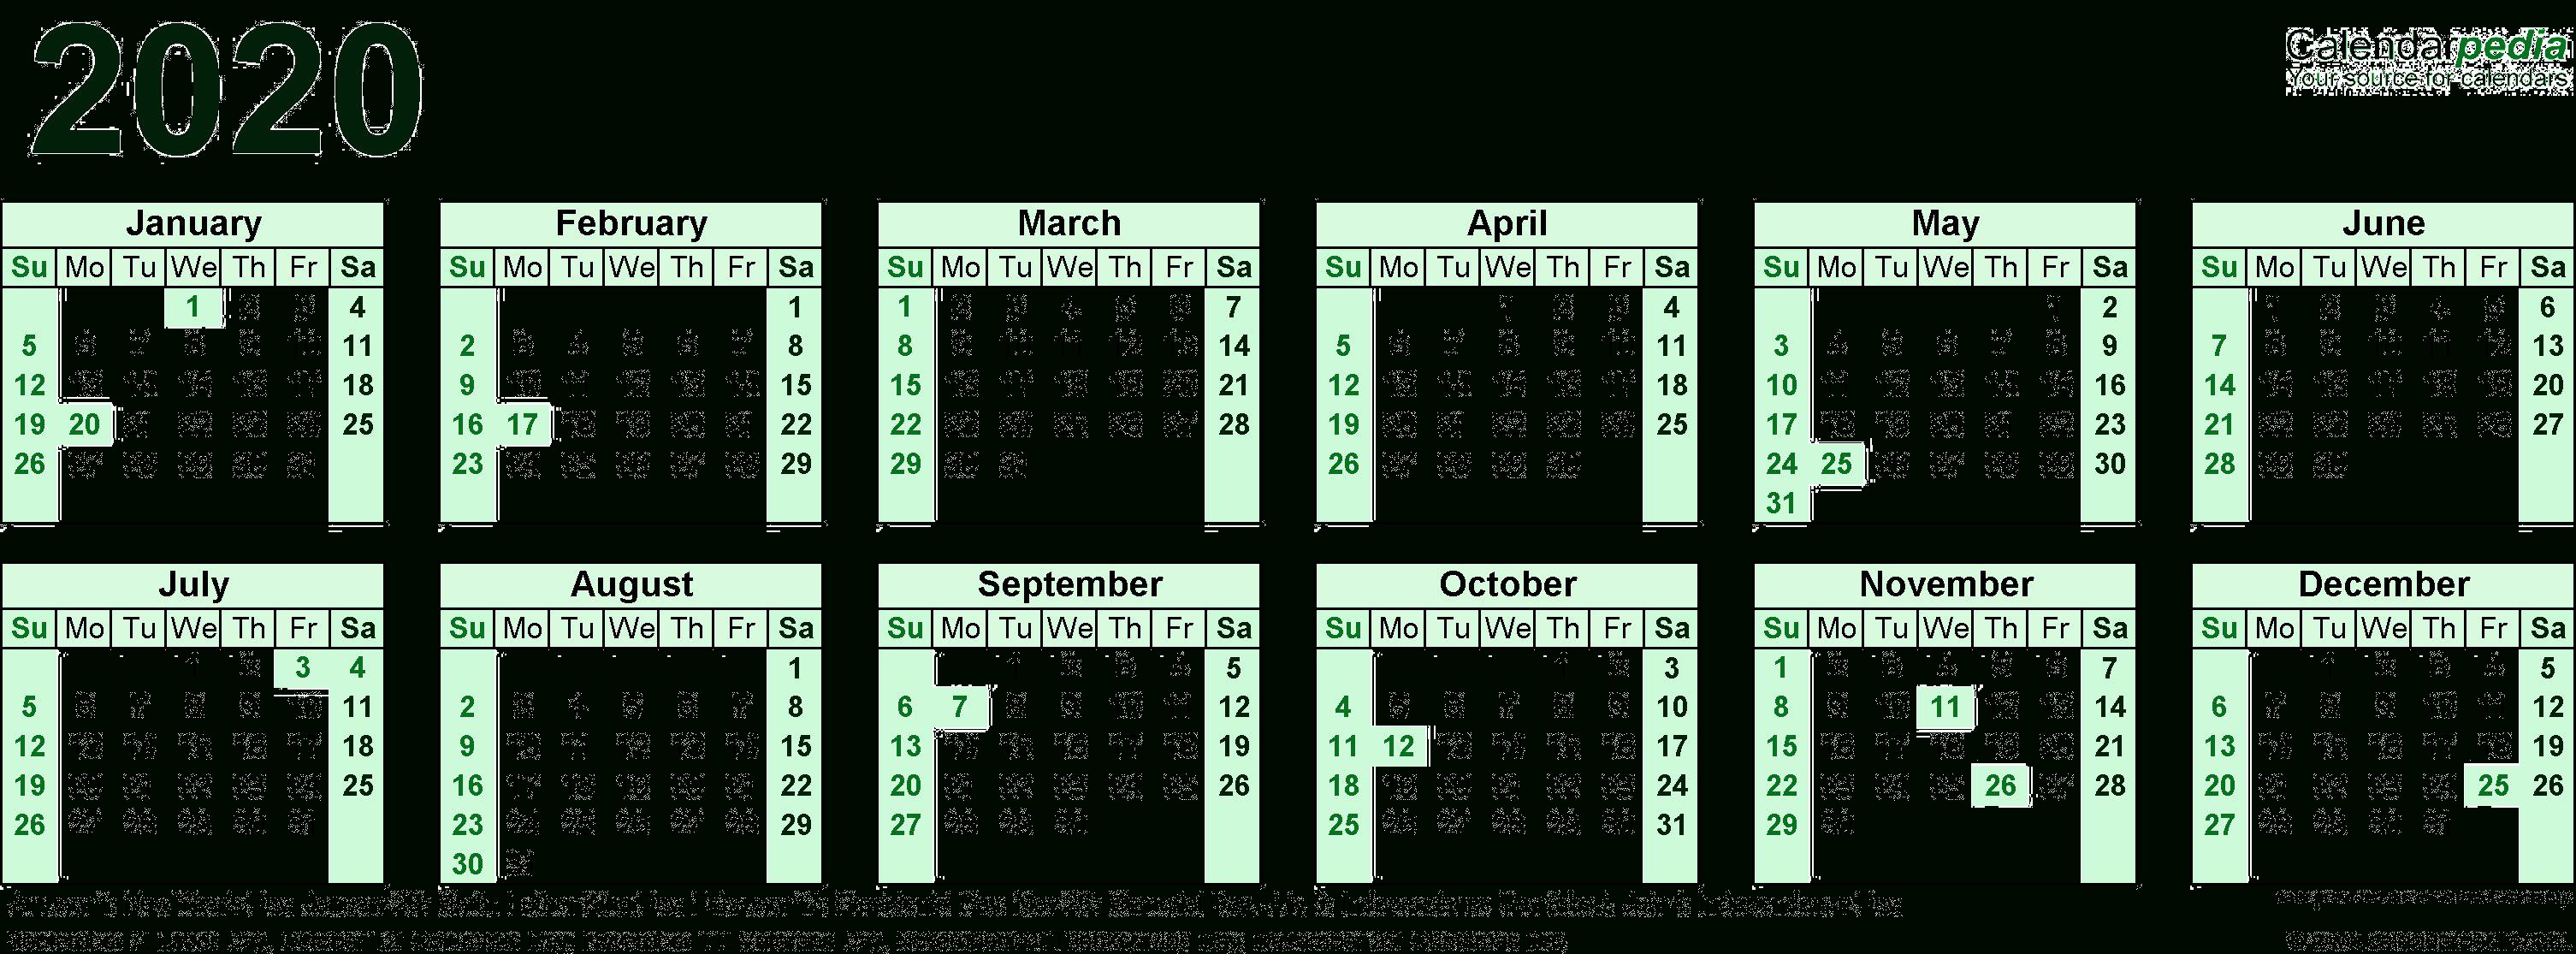 2020 Calendar Png Transparent Images | Png All regarding November Calendar 2020 Transparent